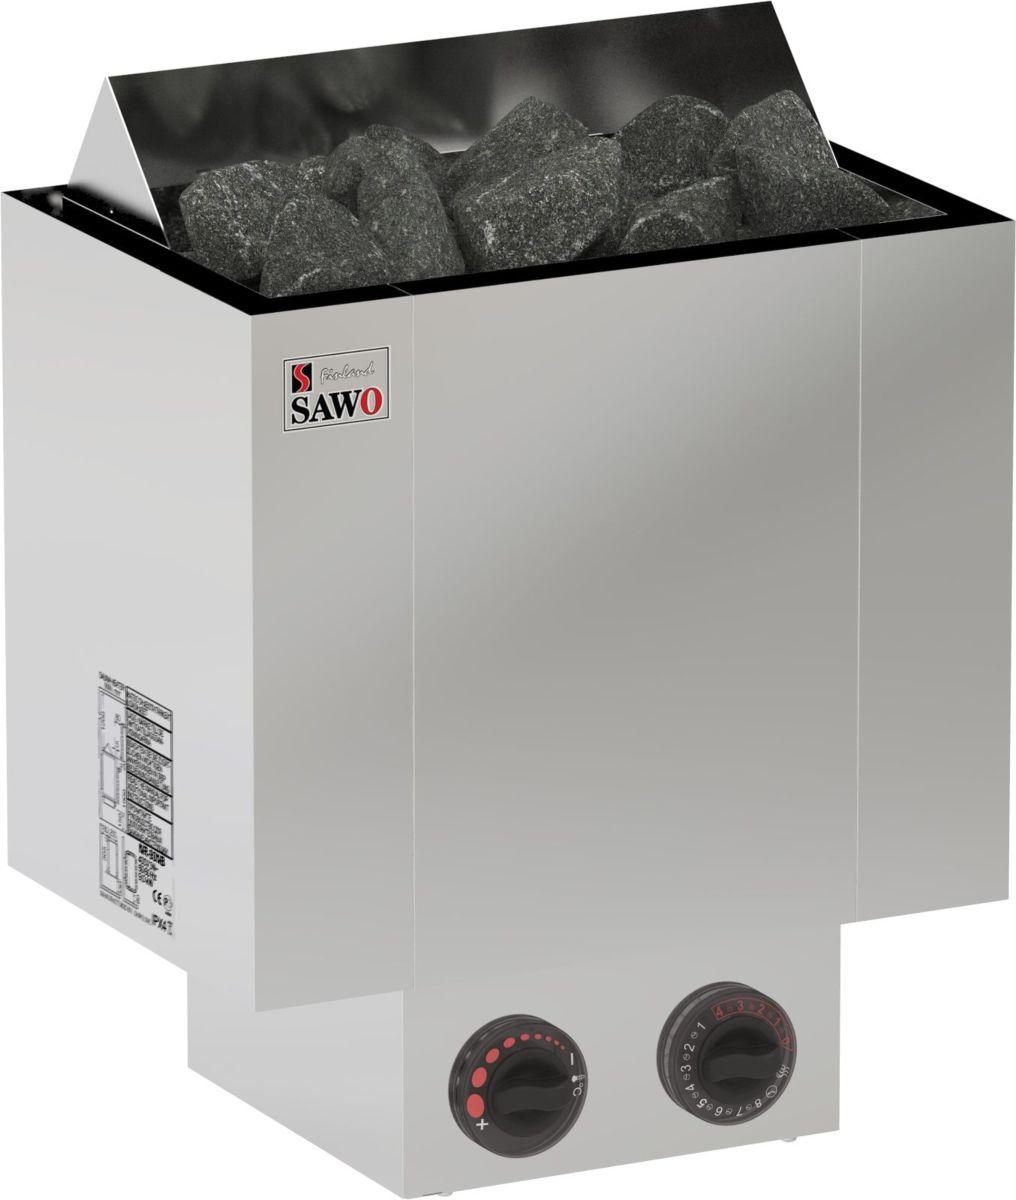 Печь для бани SAWO Nordex NRX-80NB-Z